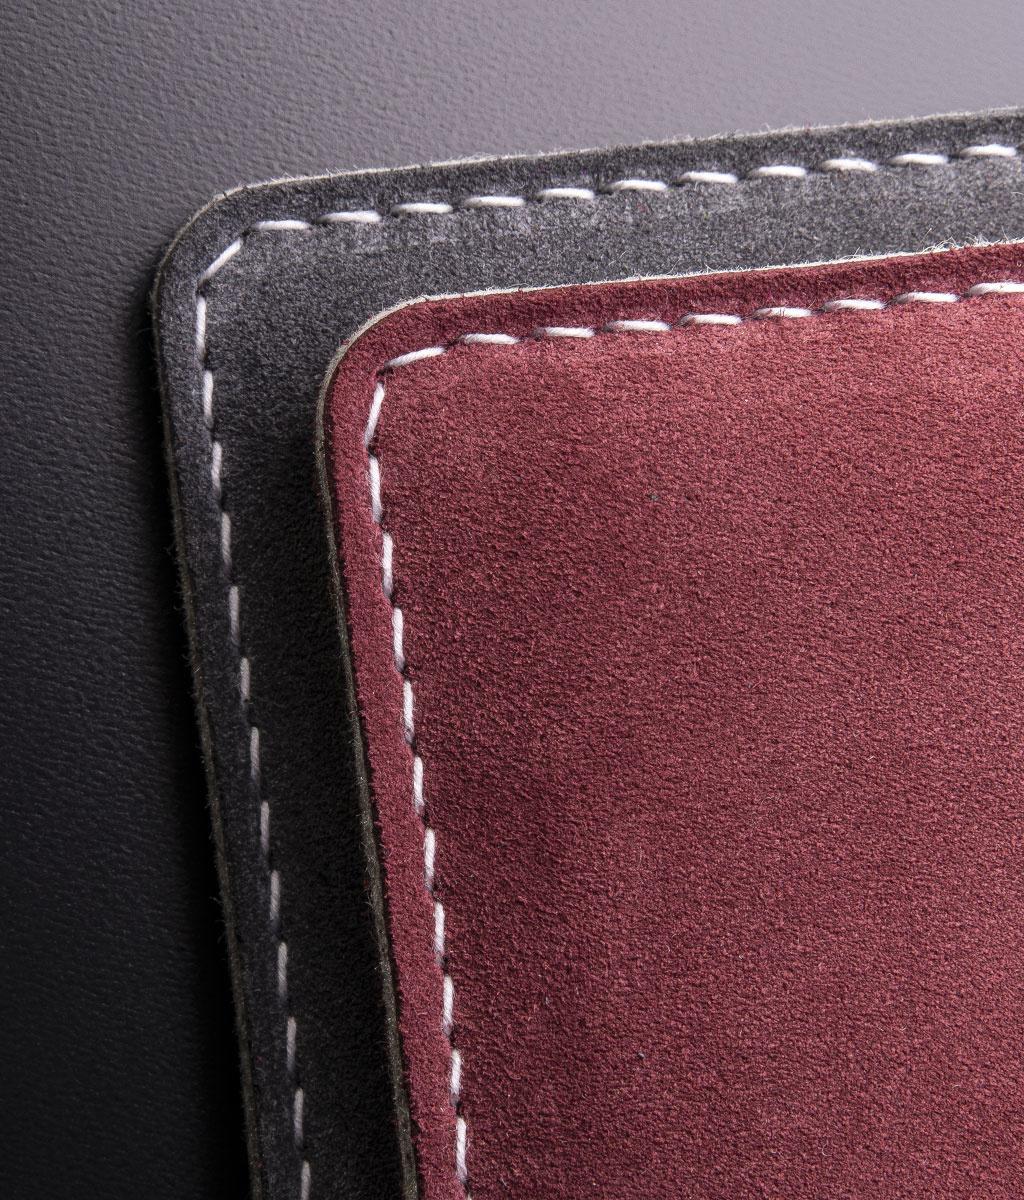 Google Pixel 5, 4 XL, 4a suede leather sleeve, case SCHUTZMASSNAHME suitable for your Google phone